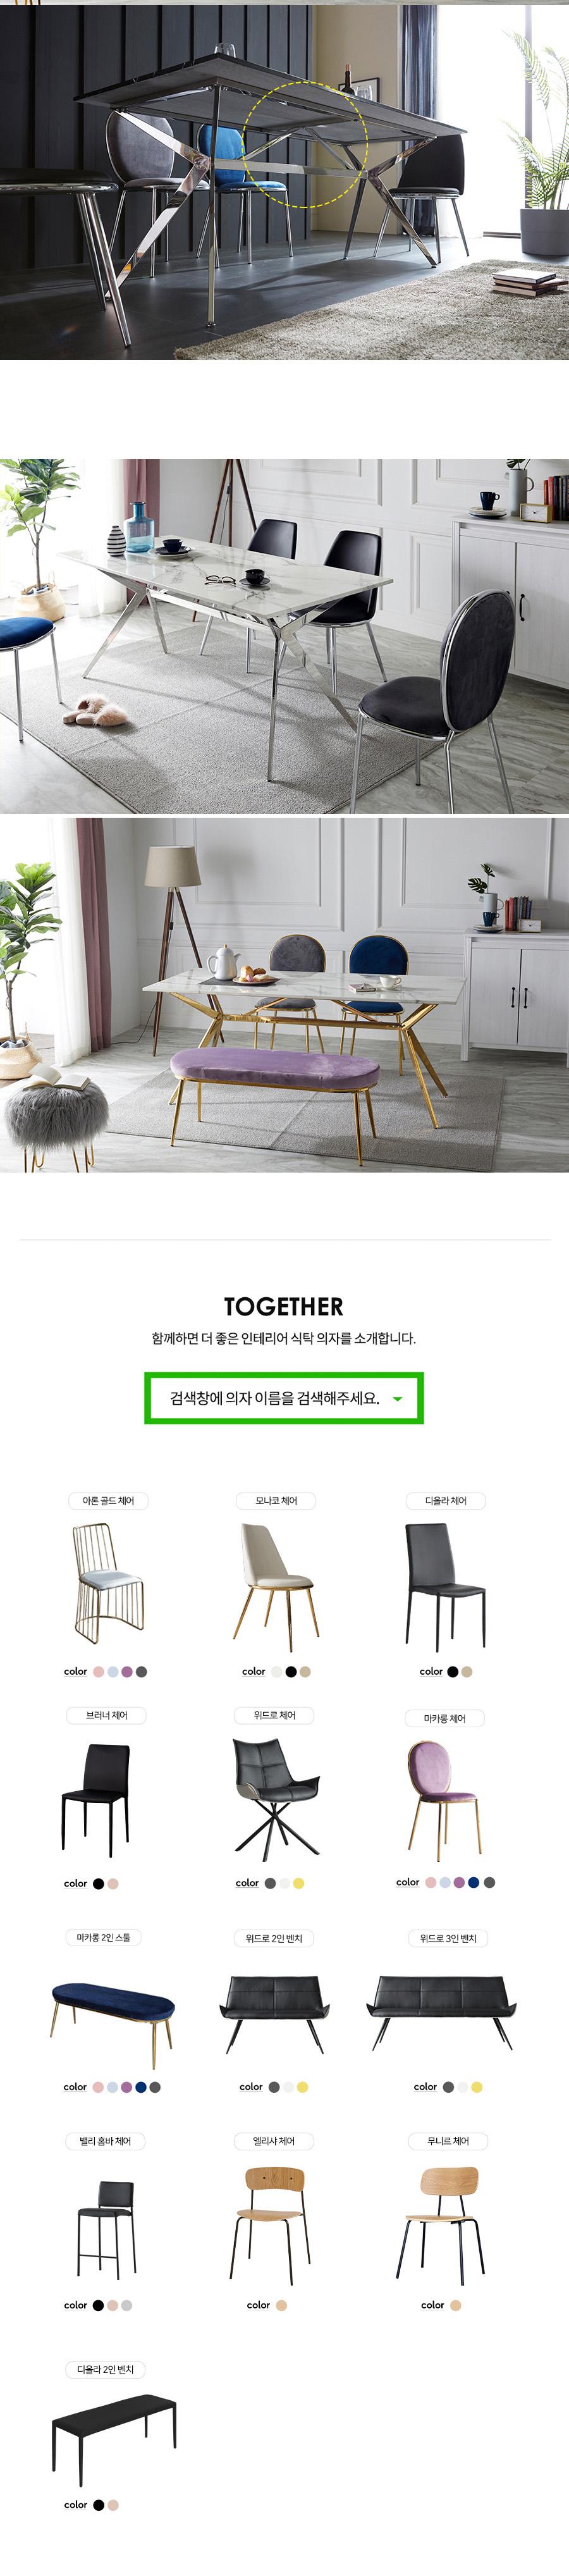 TS 베일리 실버 대리석식탁 1200테이블 - 티에스퍼니처, 430,700원, 식탁/의자, 4인 식탁/세트